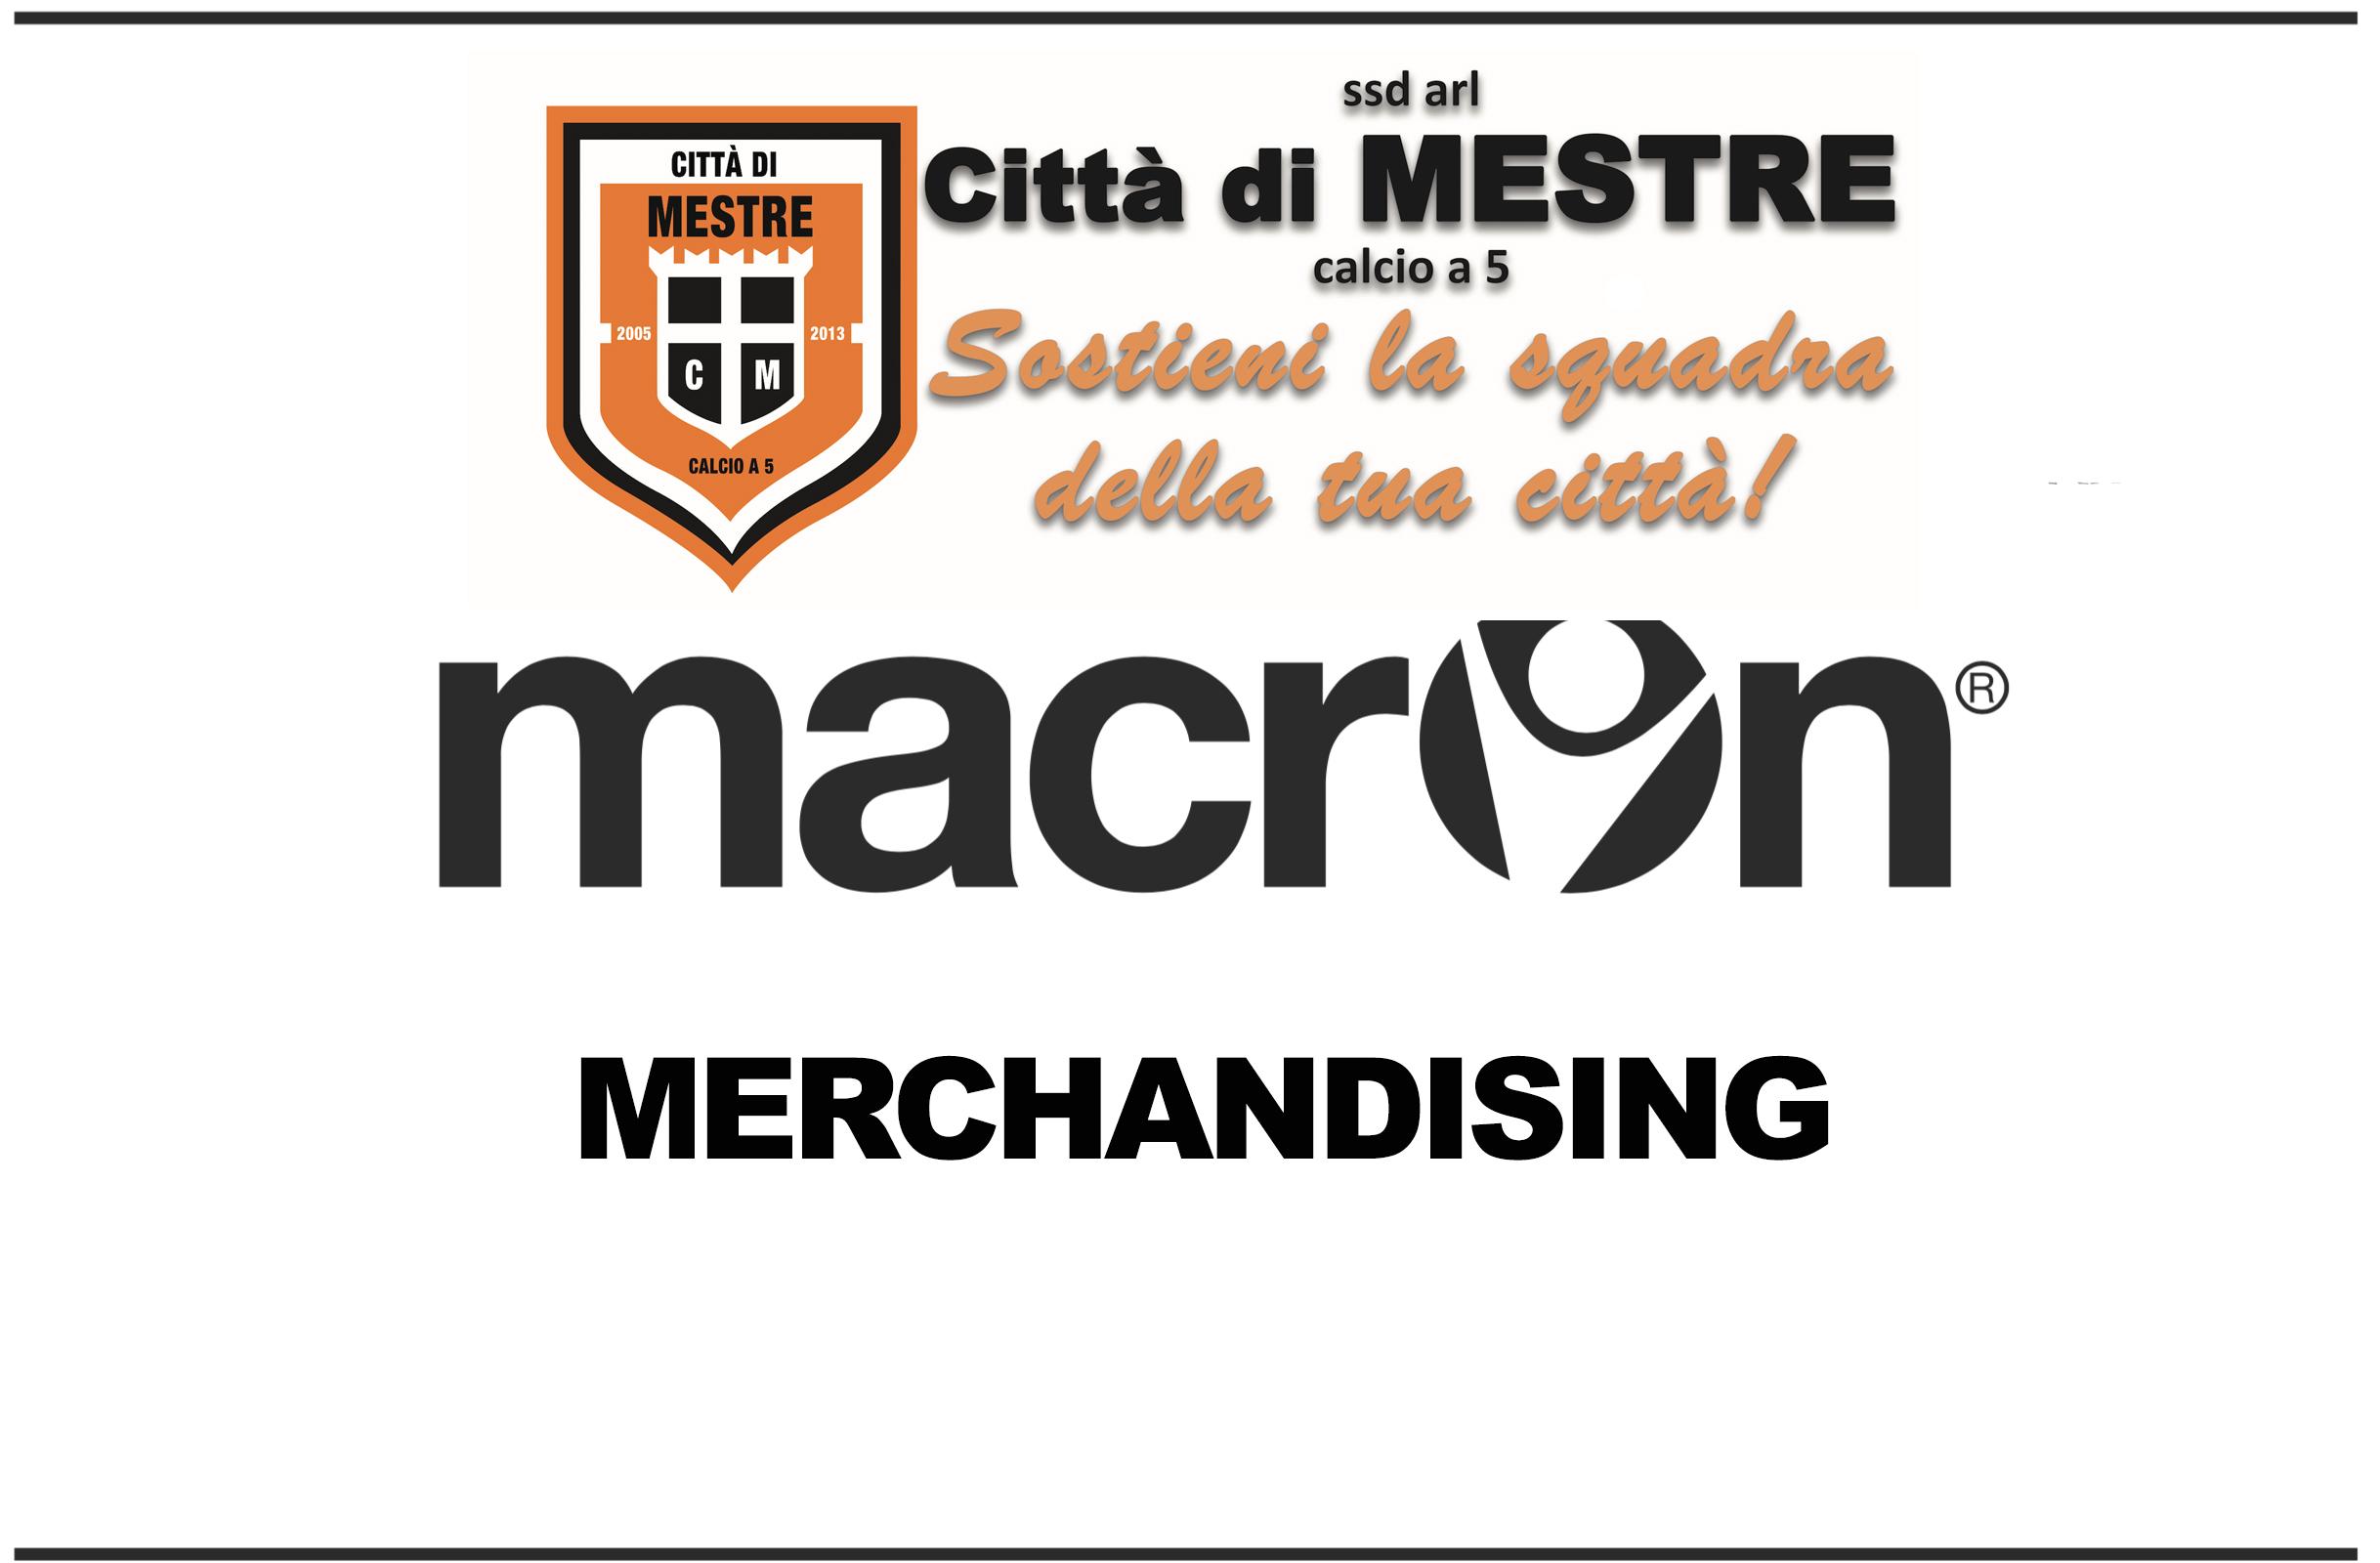 Merchandising Città di Mestre